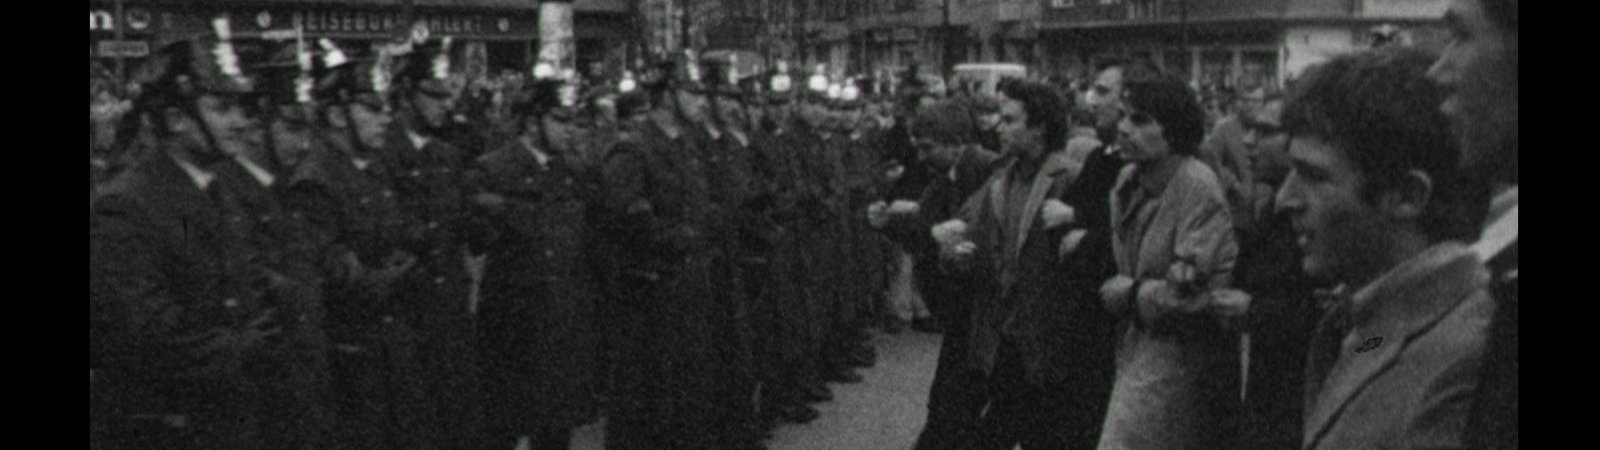 Photo dernier film Jean-Gabriel Périot